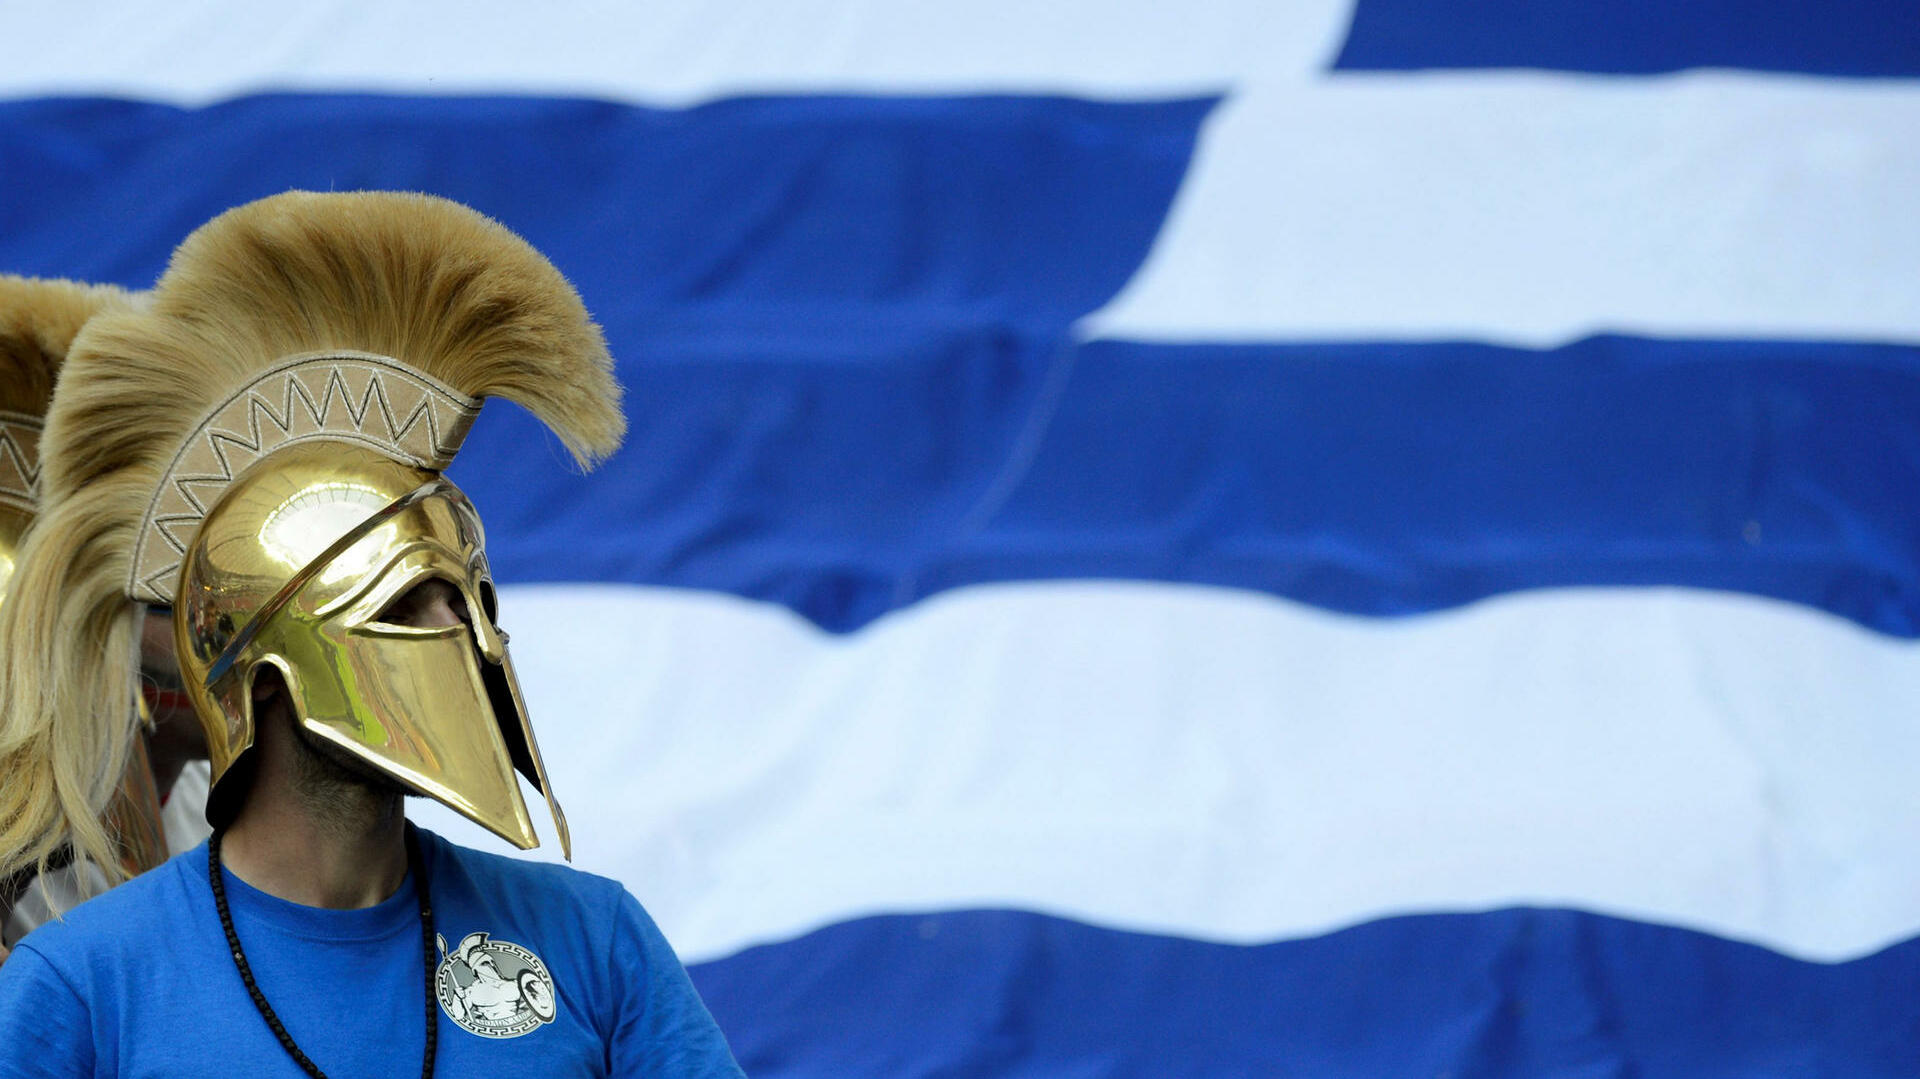 Finanzkrise: Griechenland fährt große Geschütze auf